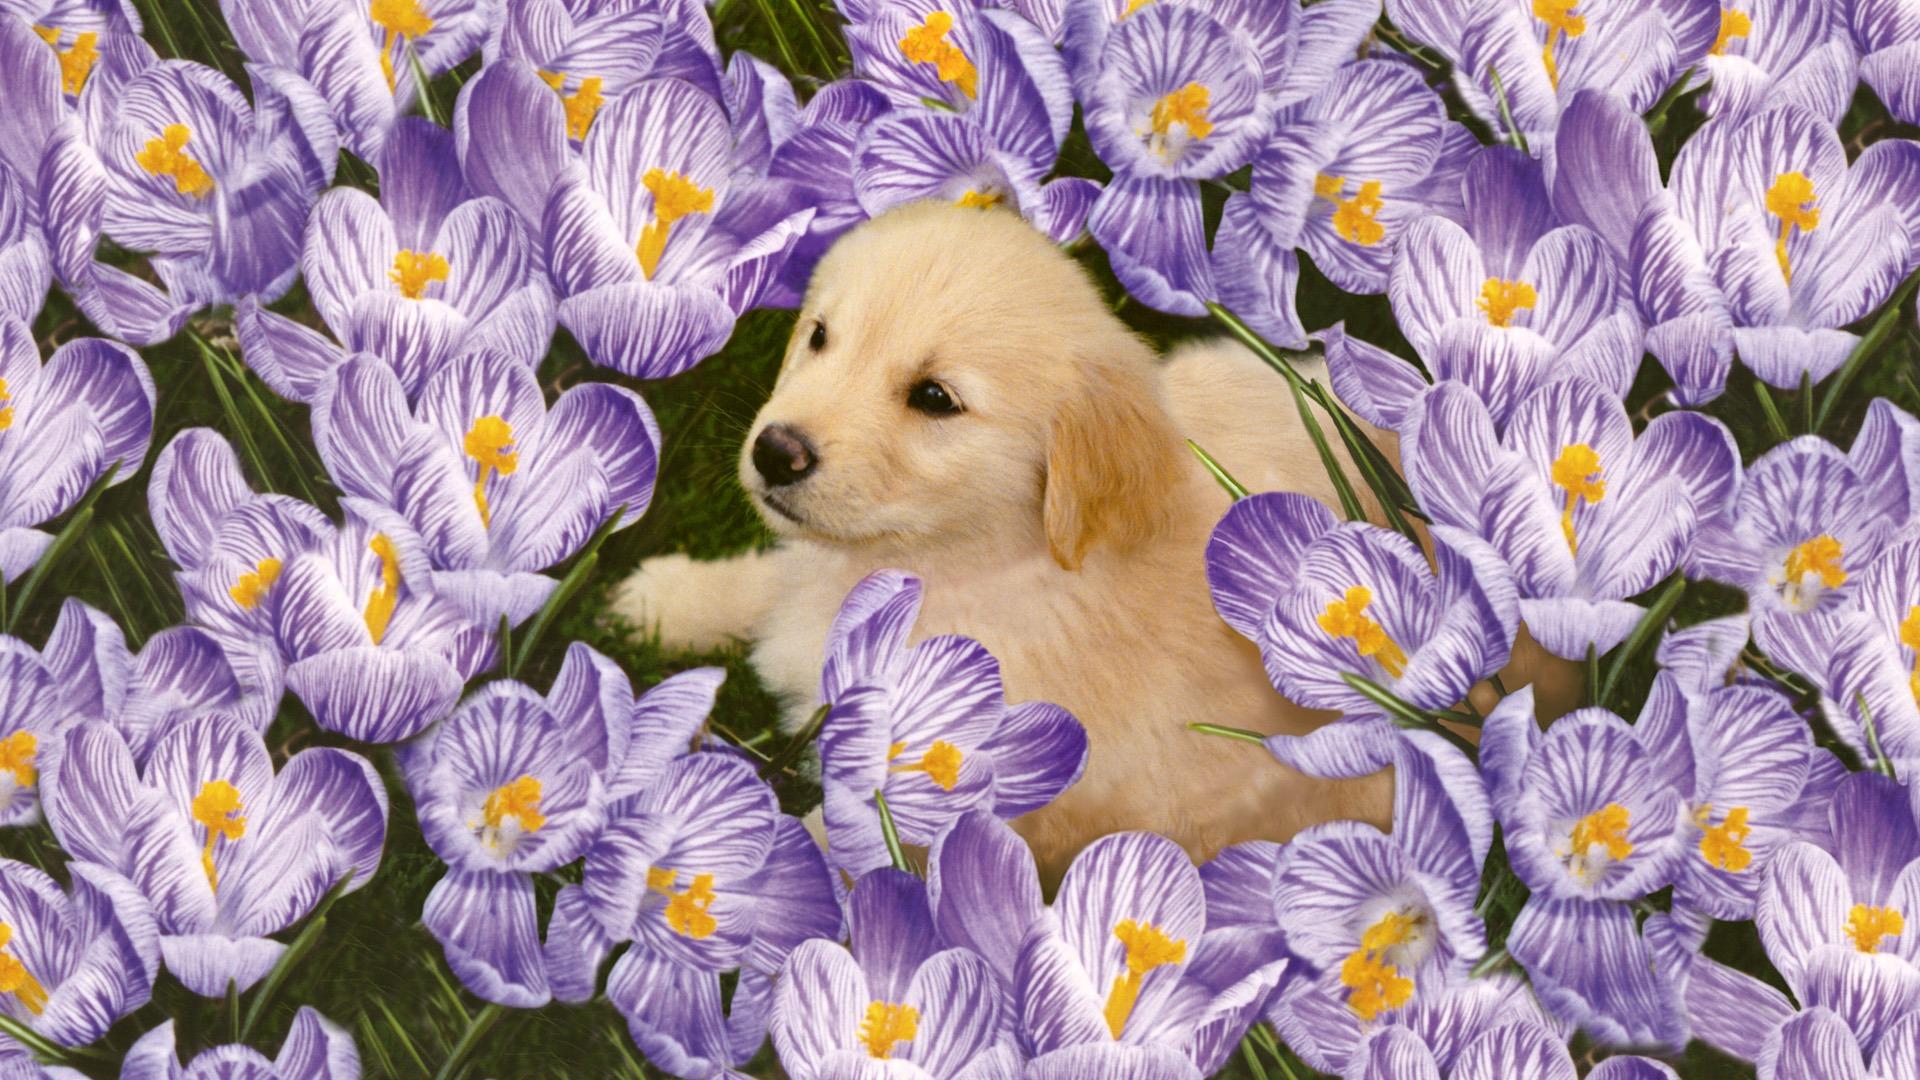 Animal HD Wallpapers 1080p Widescreen Wallpapers Animal Wallpaper 1920x1080